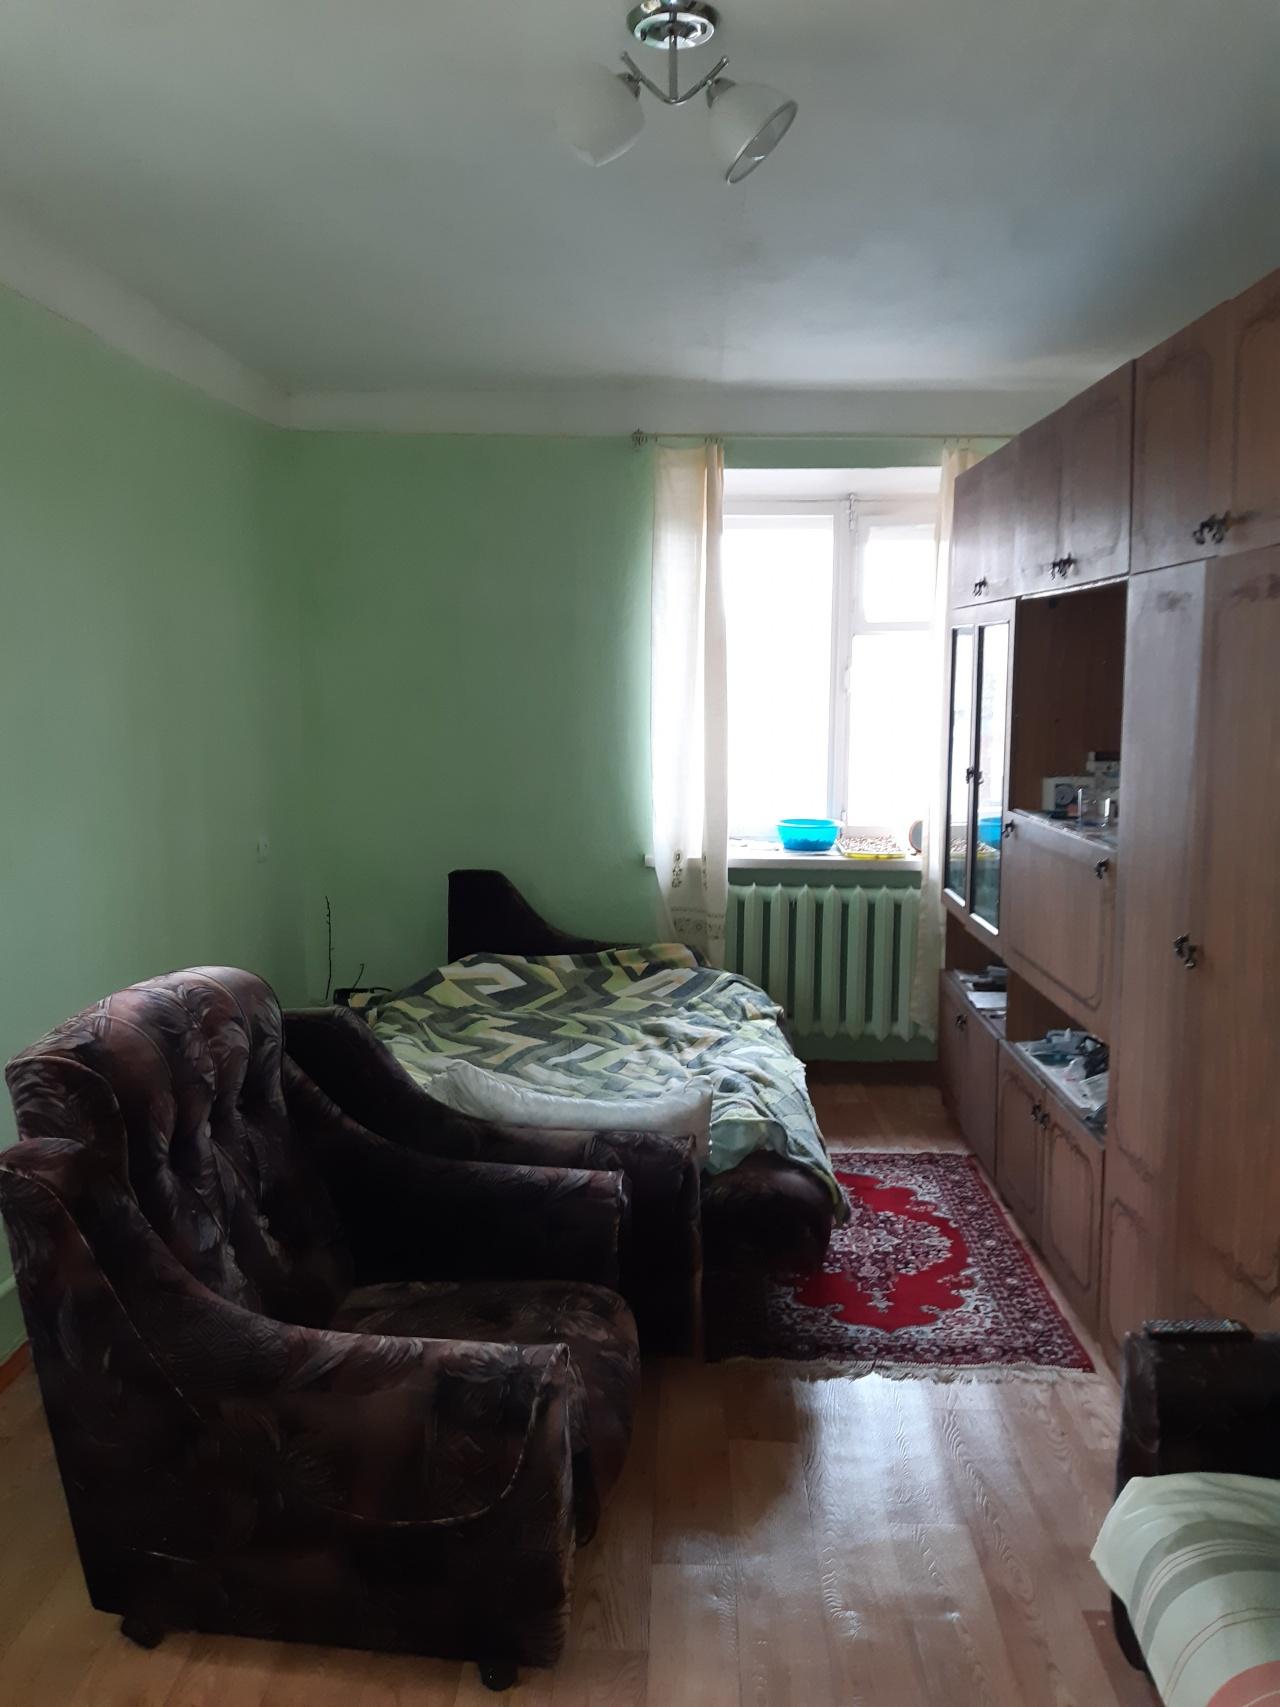 г. Владимир, Крайнова ул., 16, 1-к. квартира в аренду